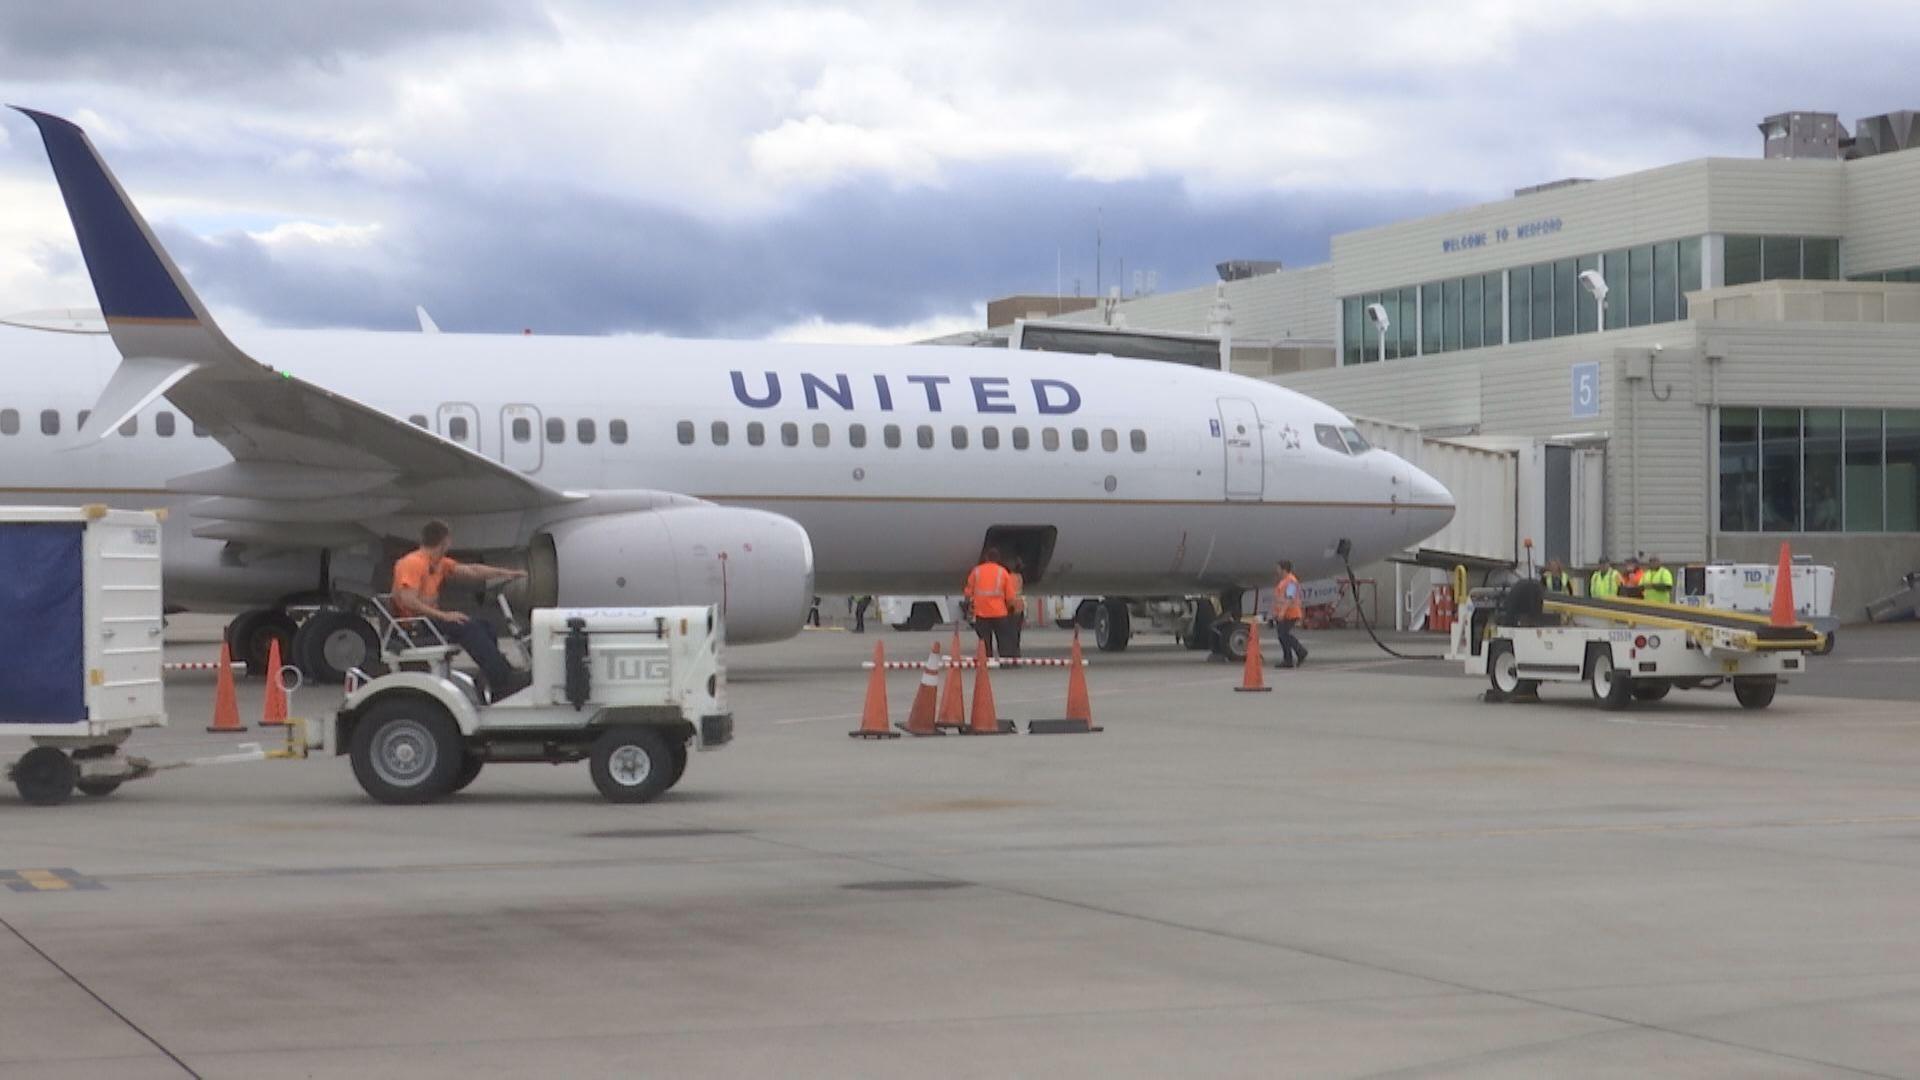 Medford Aviation Craigslist - fuel-economy info